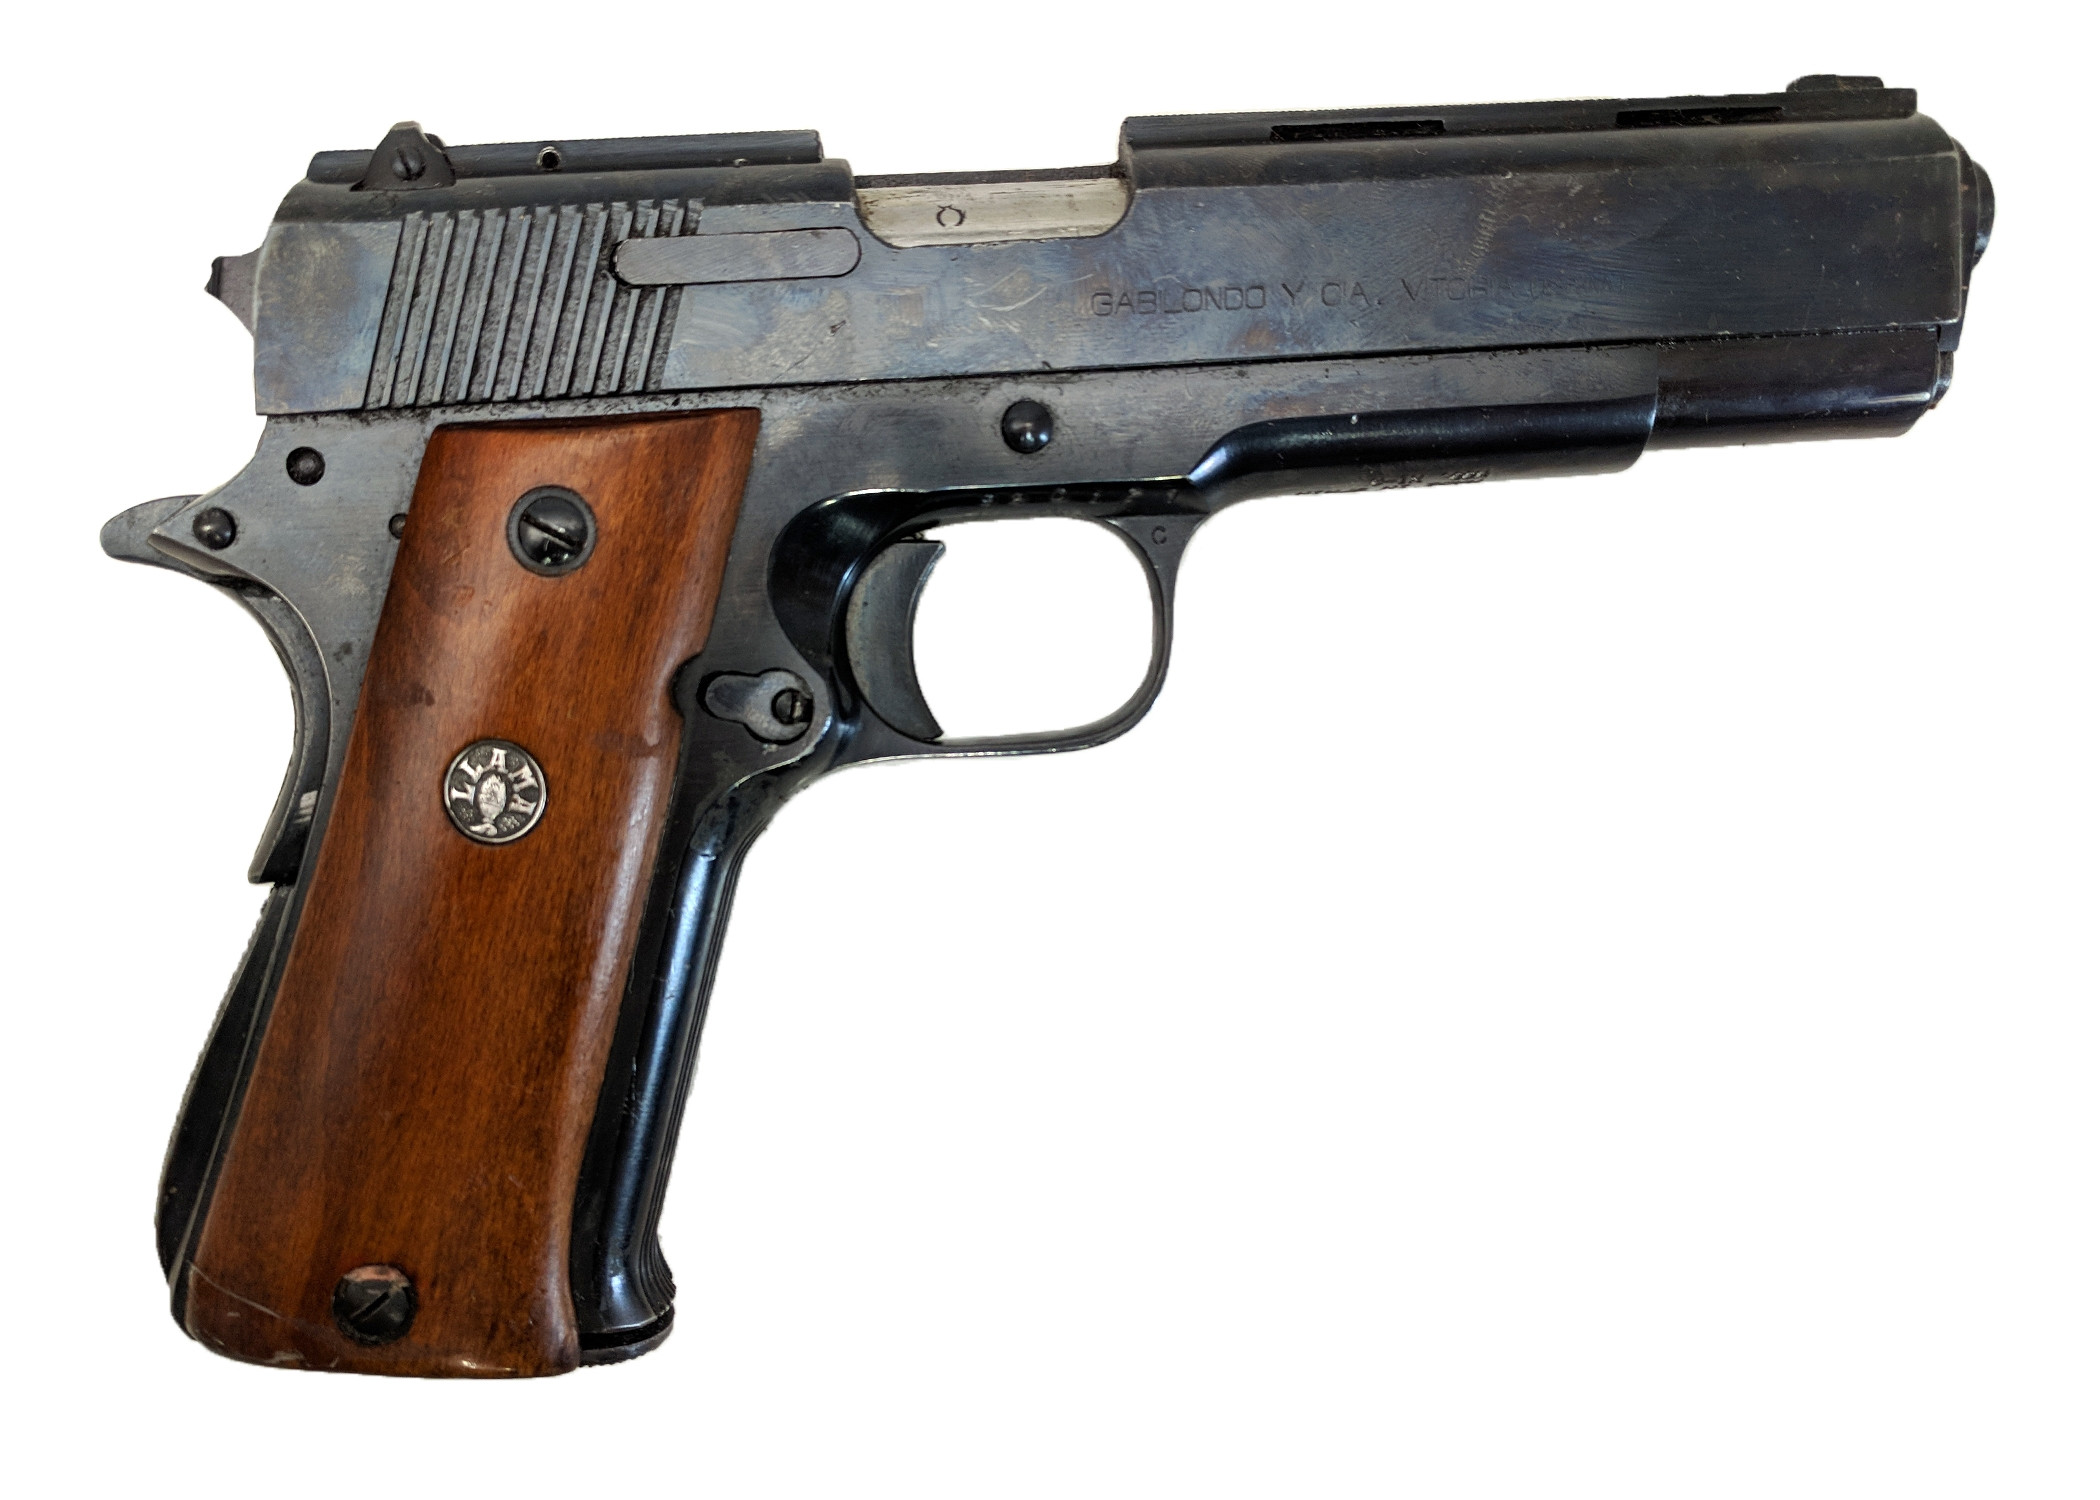 Llama XI-A, 9mm, *Very Good, Incomplete*